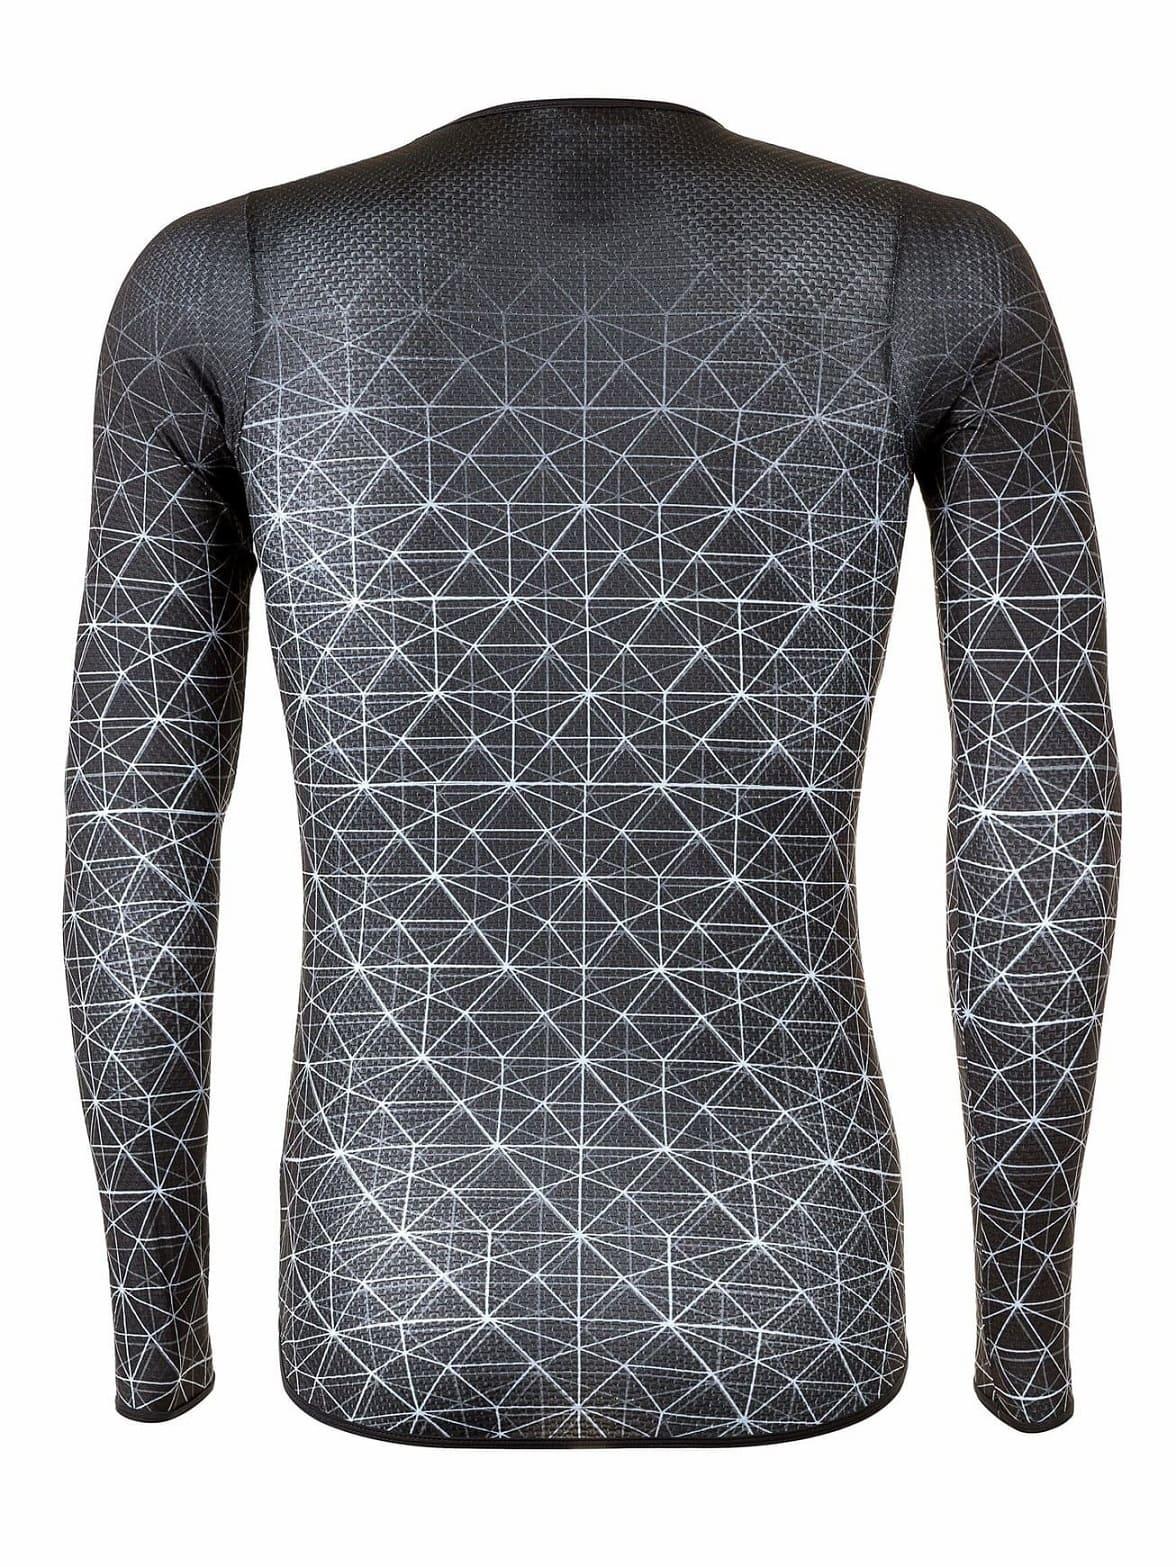 Camiseta/ Blusa Manga Longa Segunda Pele ML Fern Unissex Mauro Ribeiro